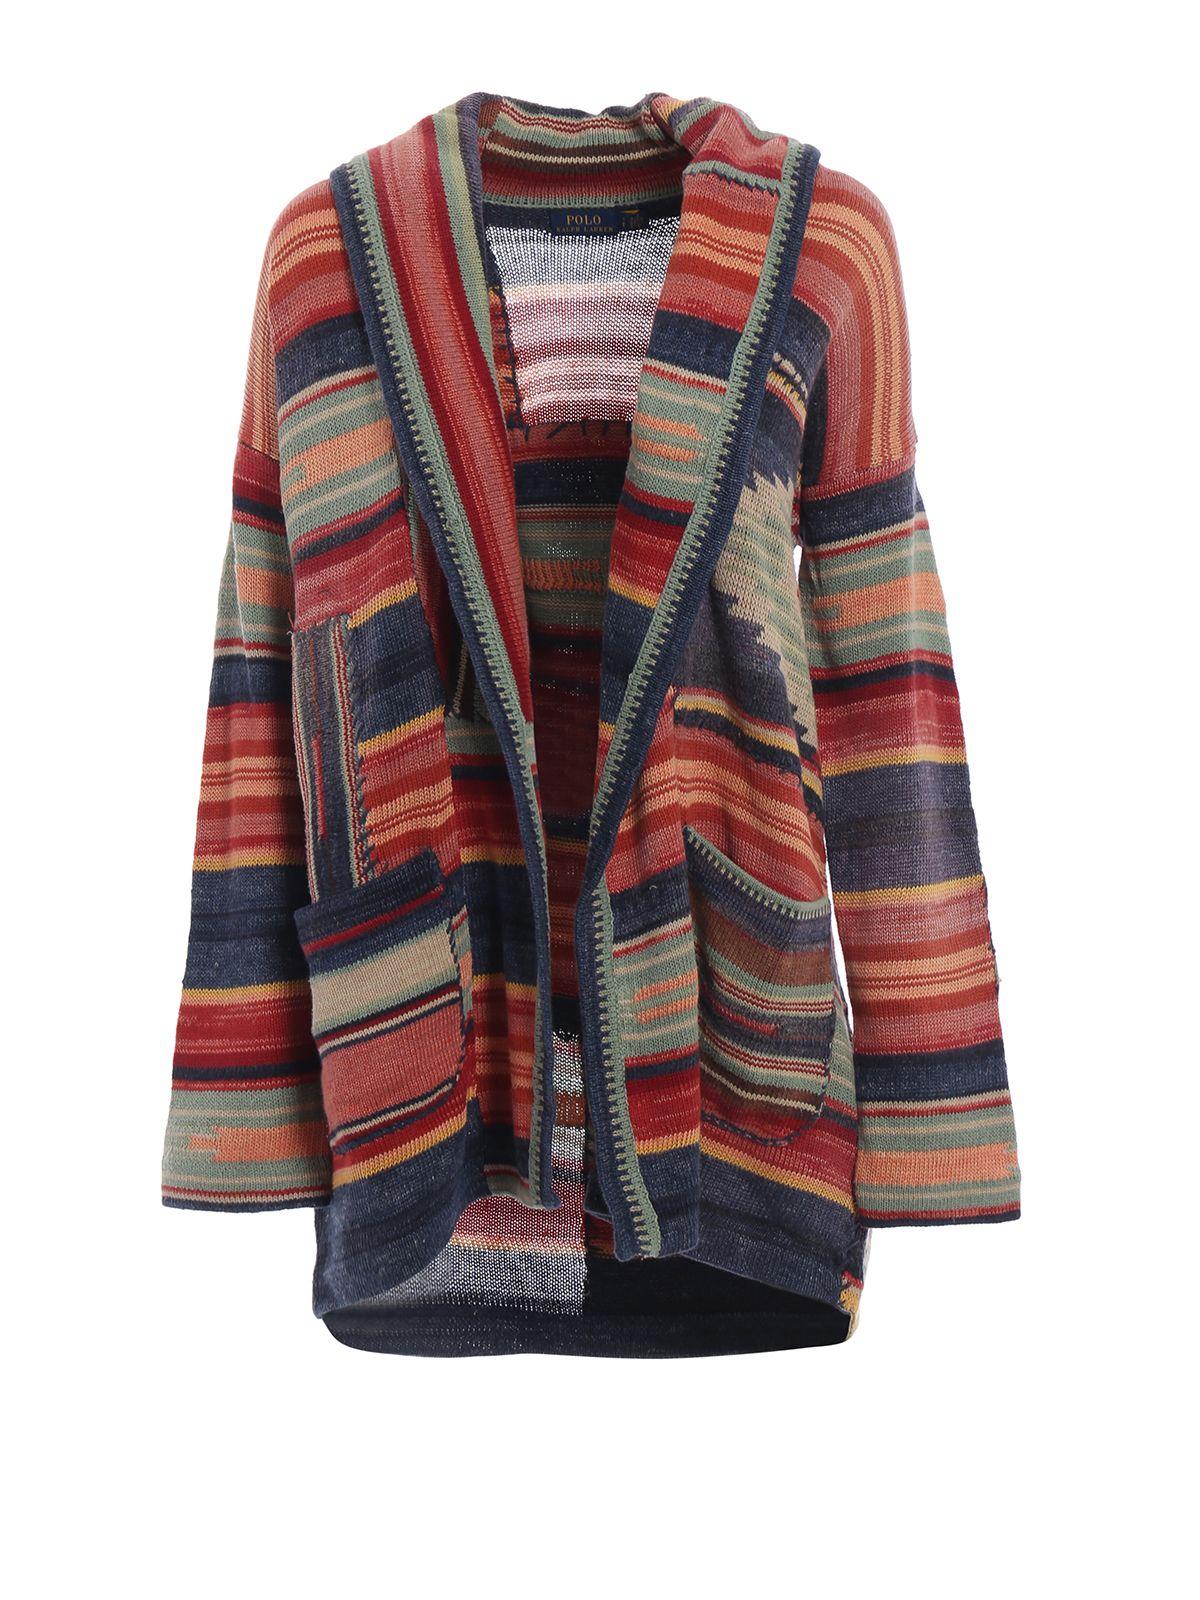 Polo Ralph Lauren Multicolour Linen Cotton Silk Cardigan